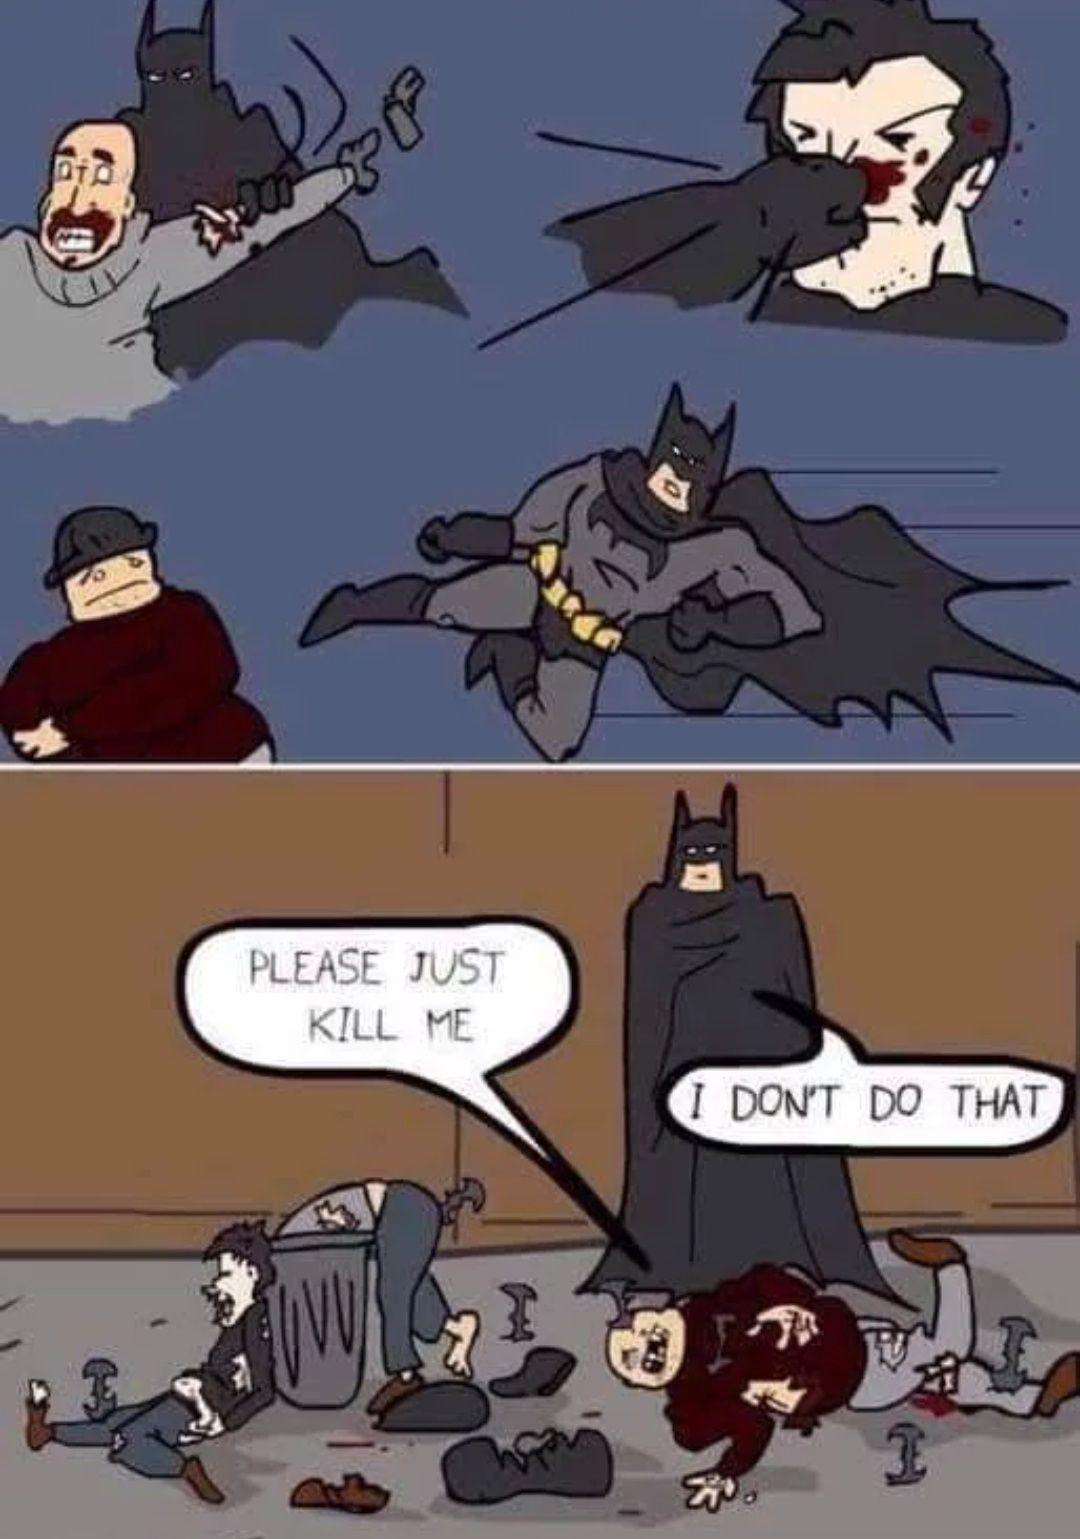 Batman has standards